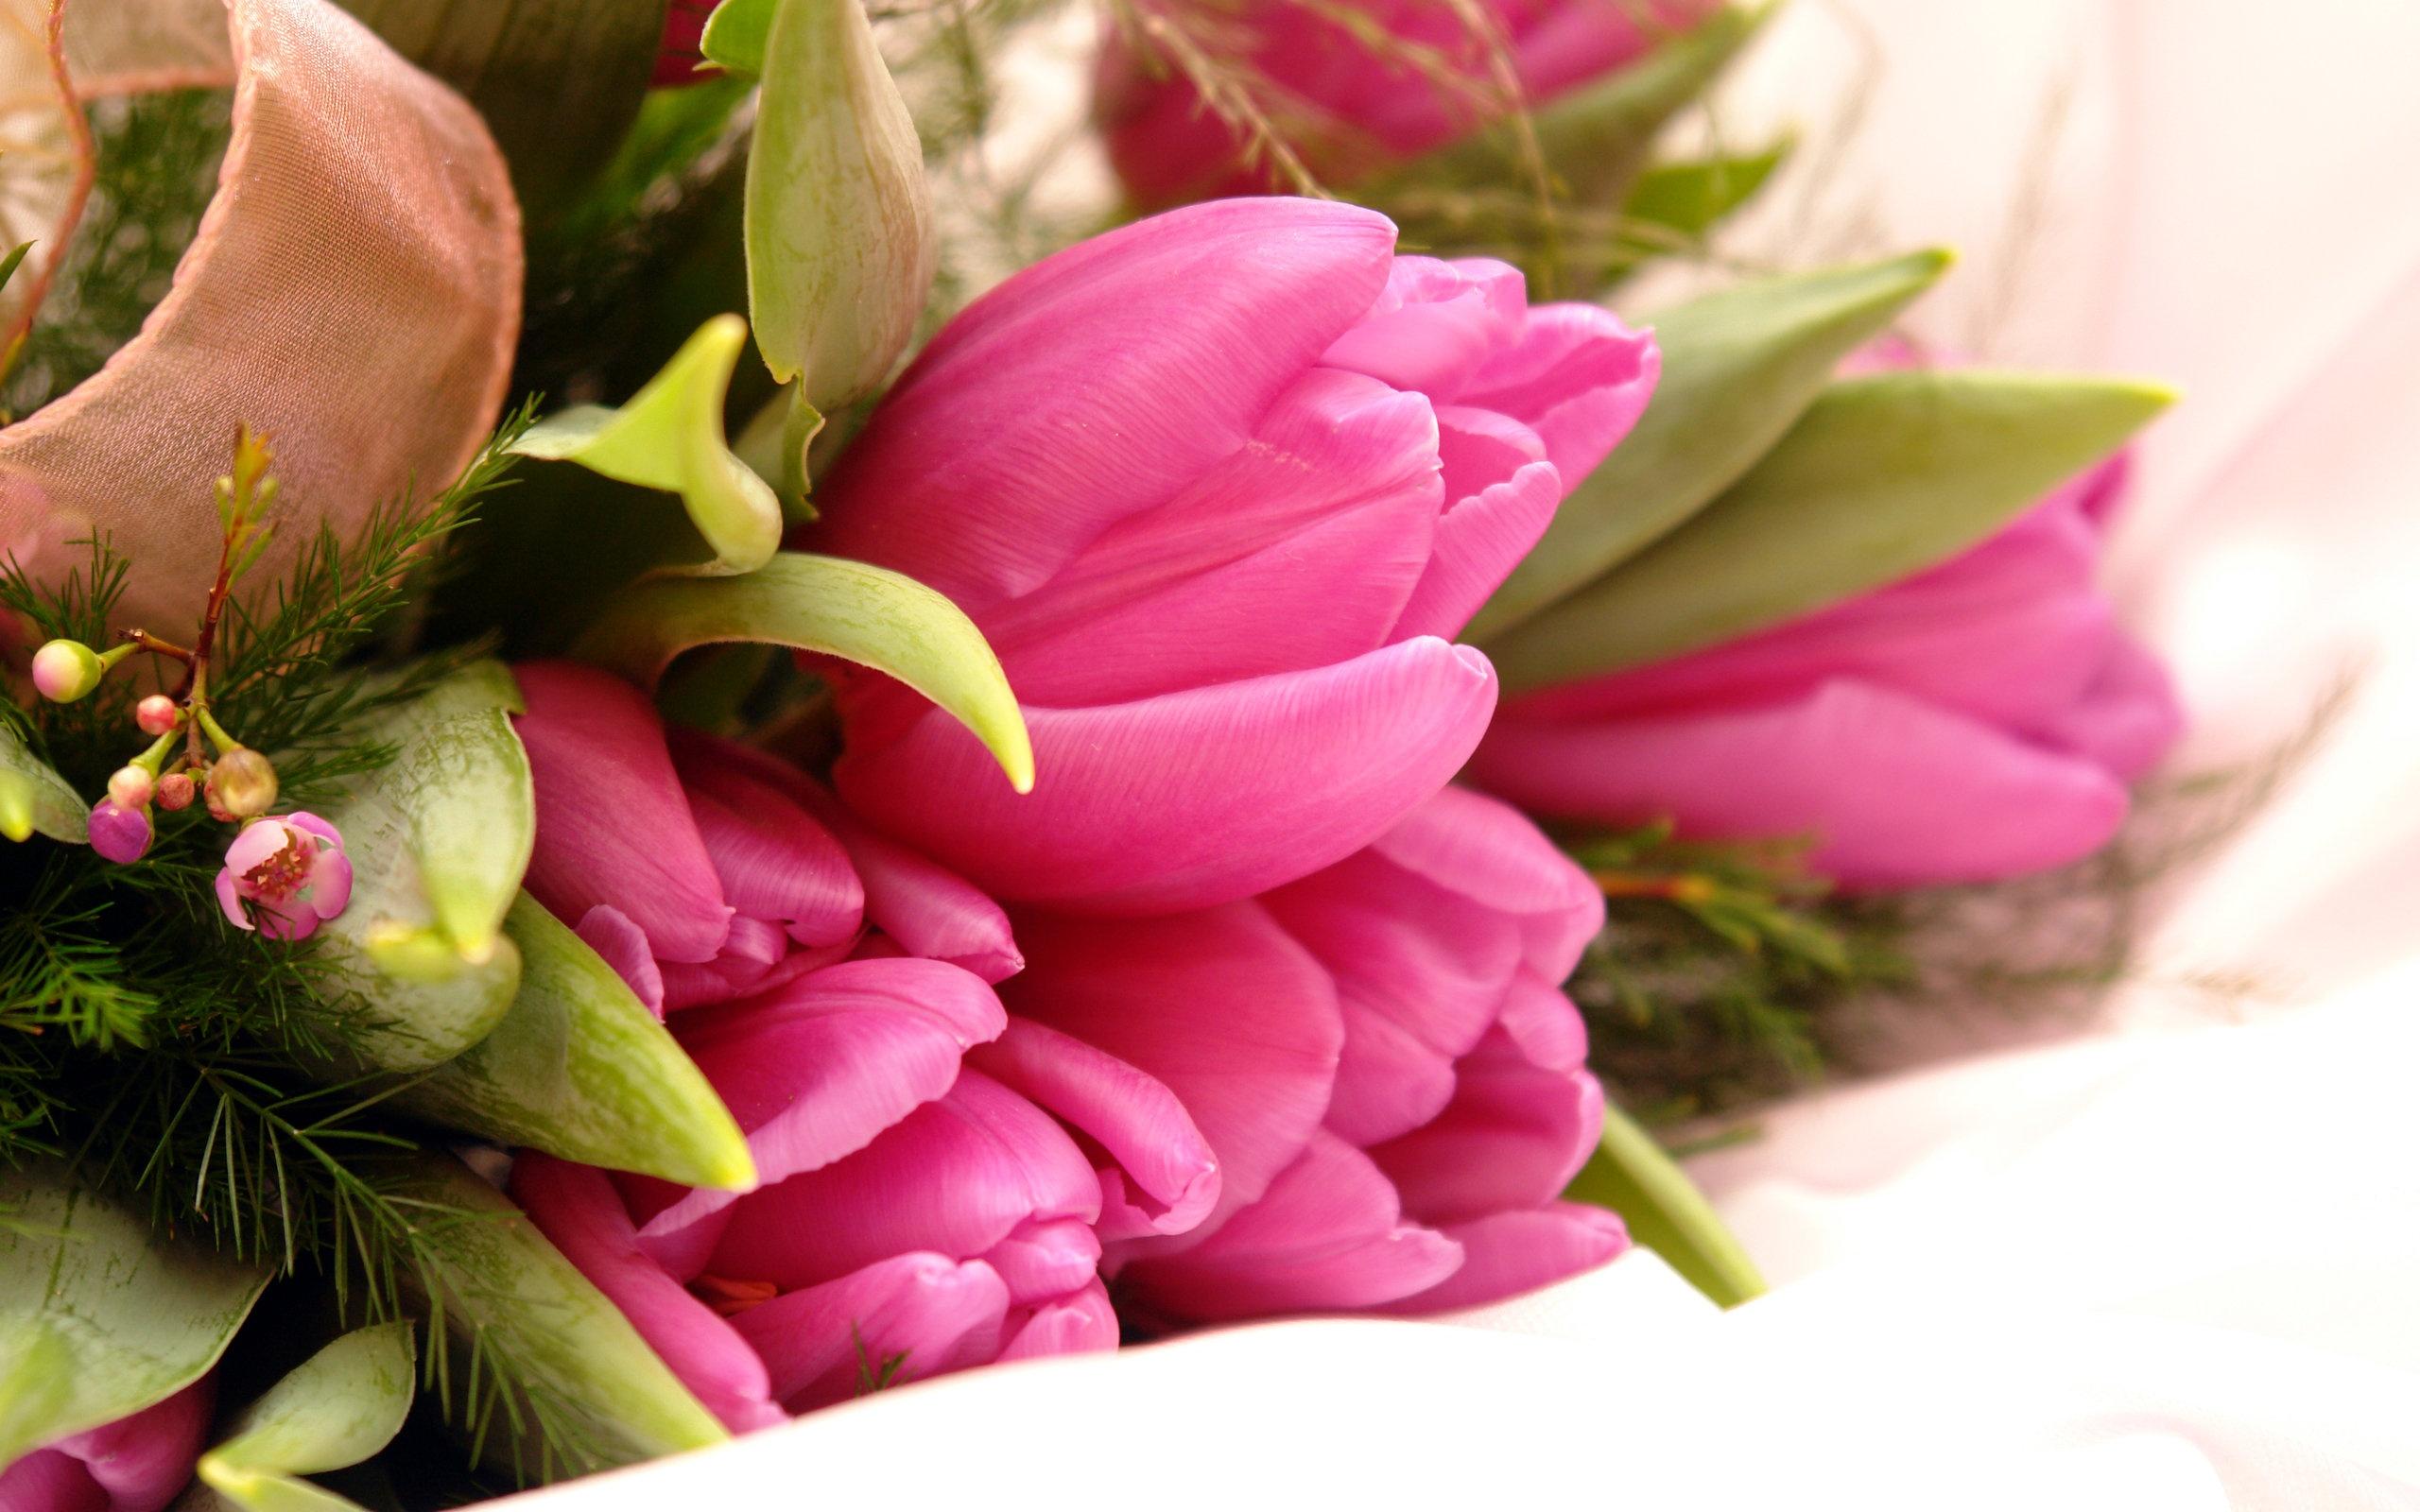 Fancy pink flowers wallpapers in jpg format for free download fancy pink flowers wallpapers mightylinksfo Images